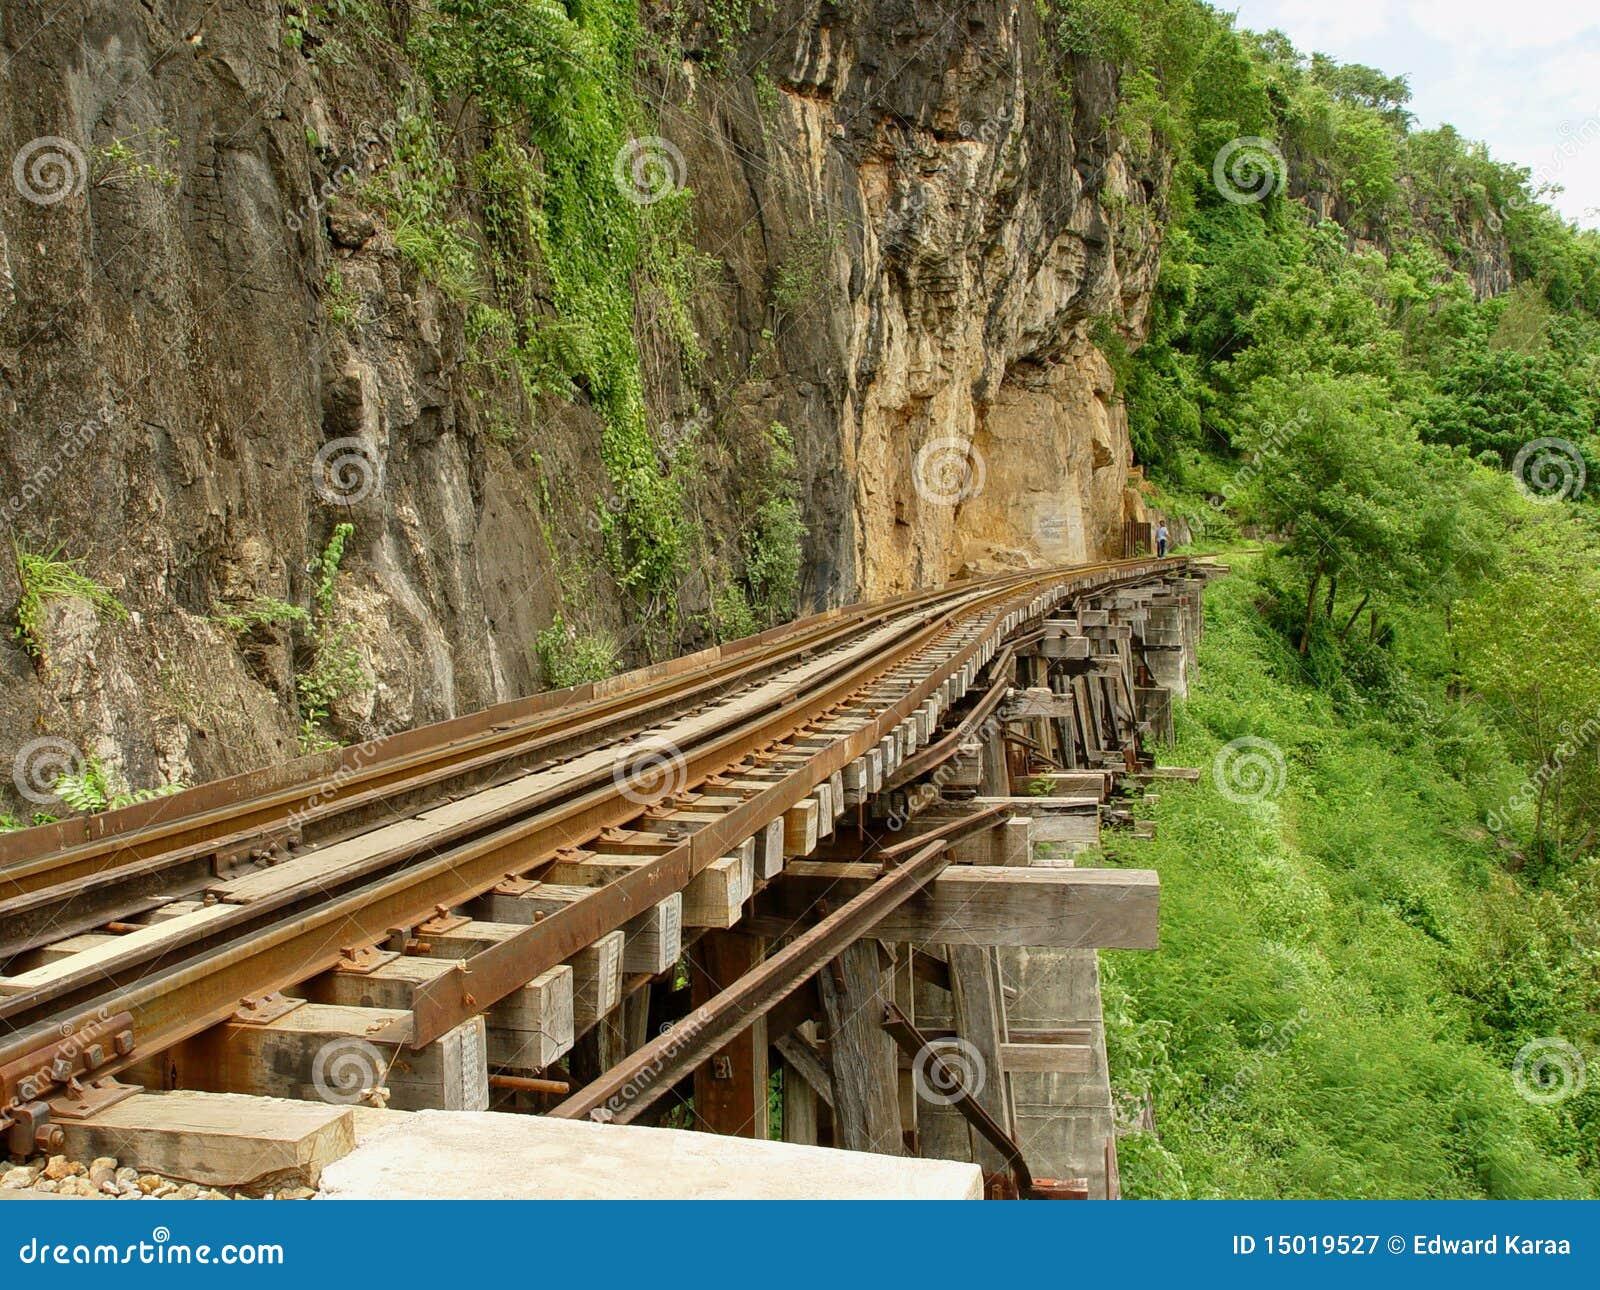 Death Railway near Krasae Cave.